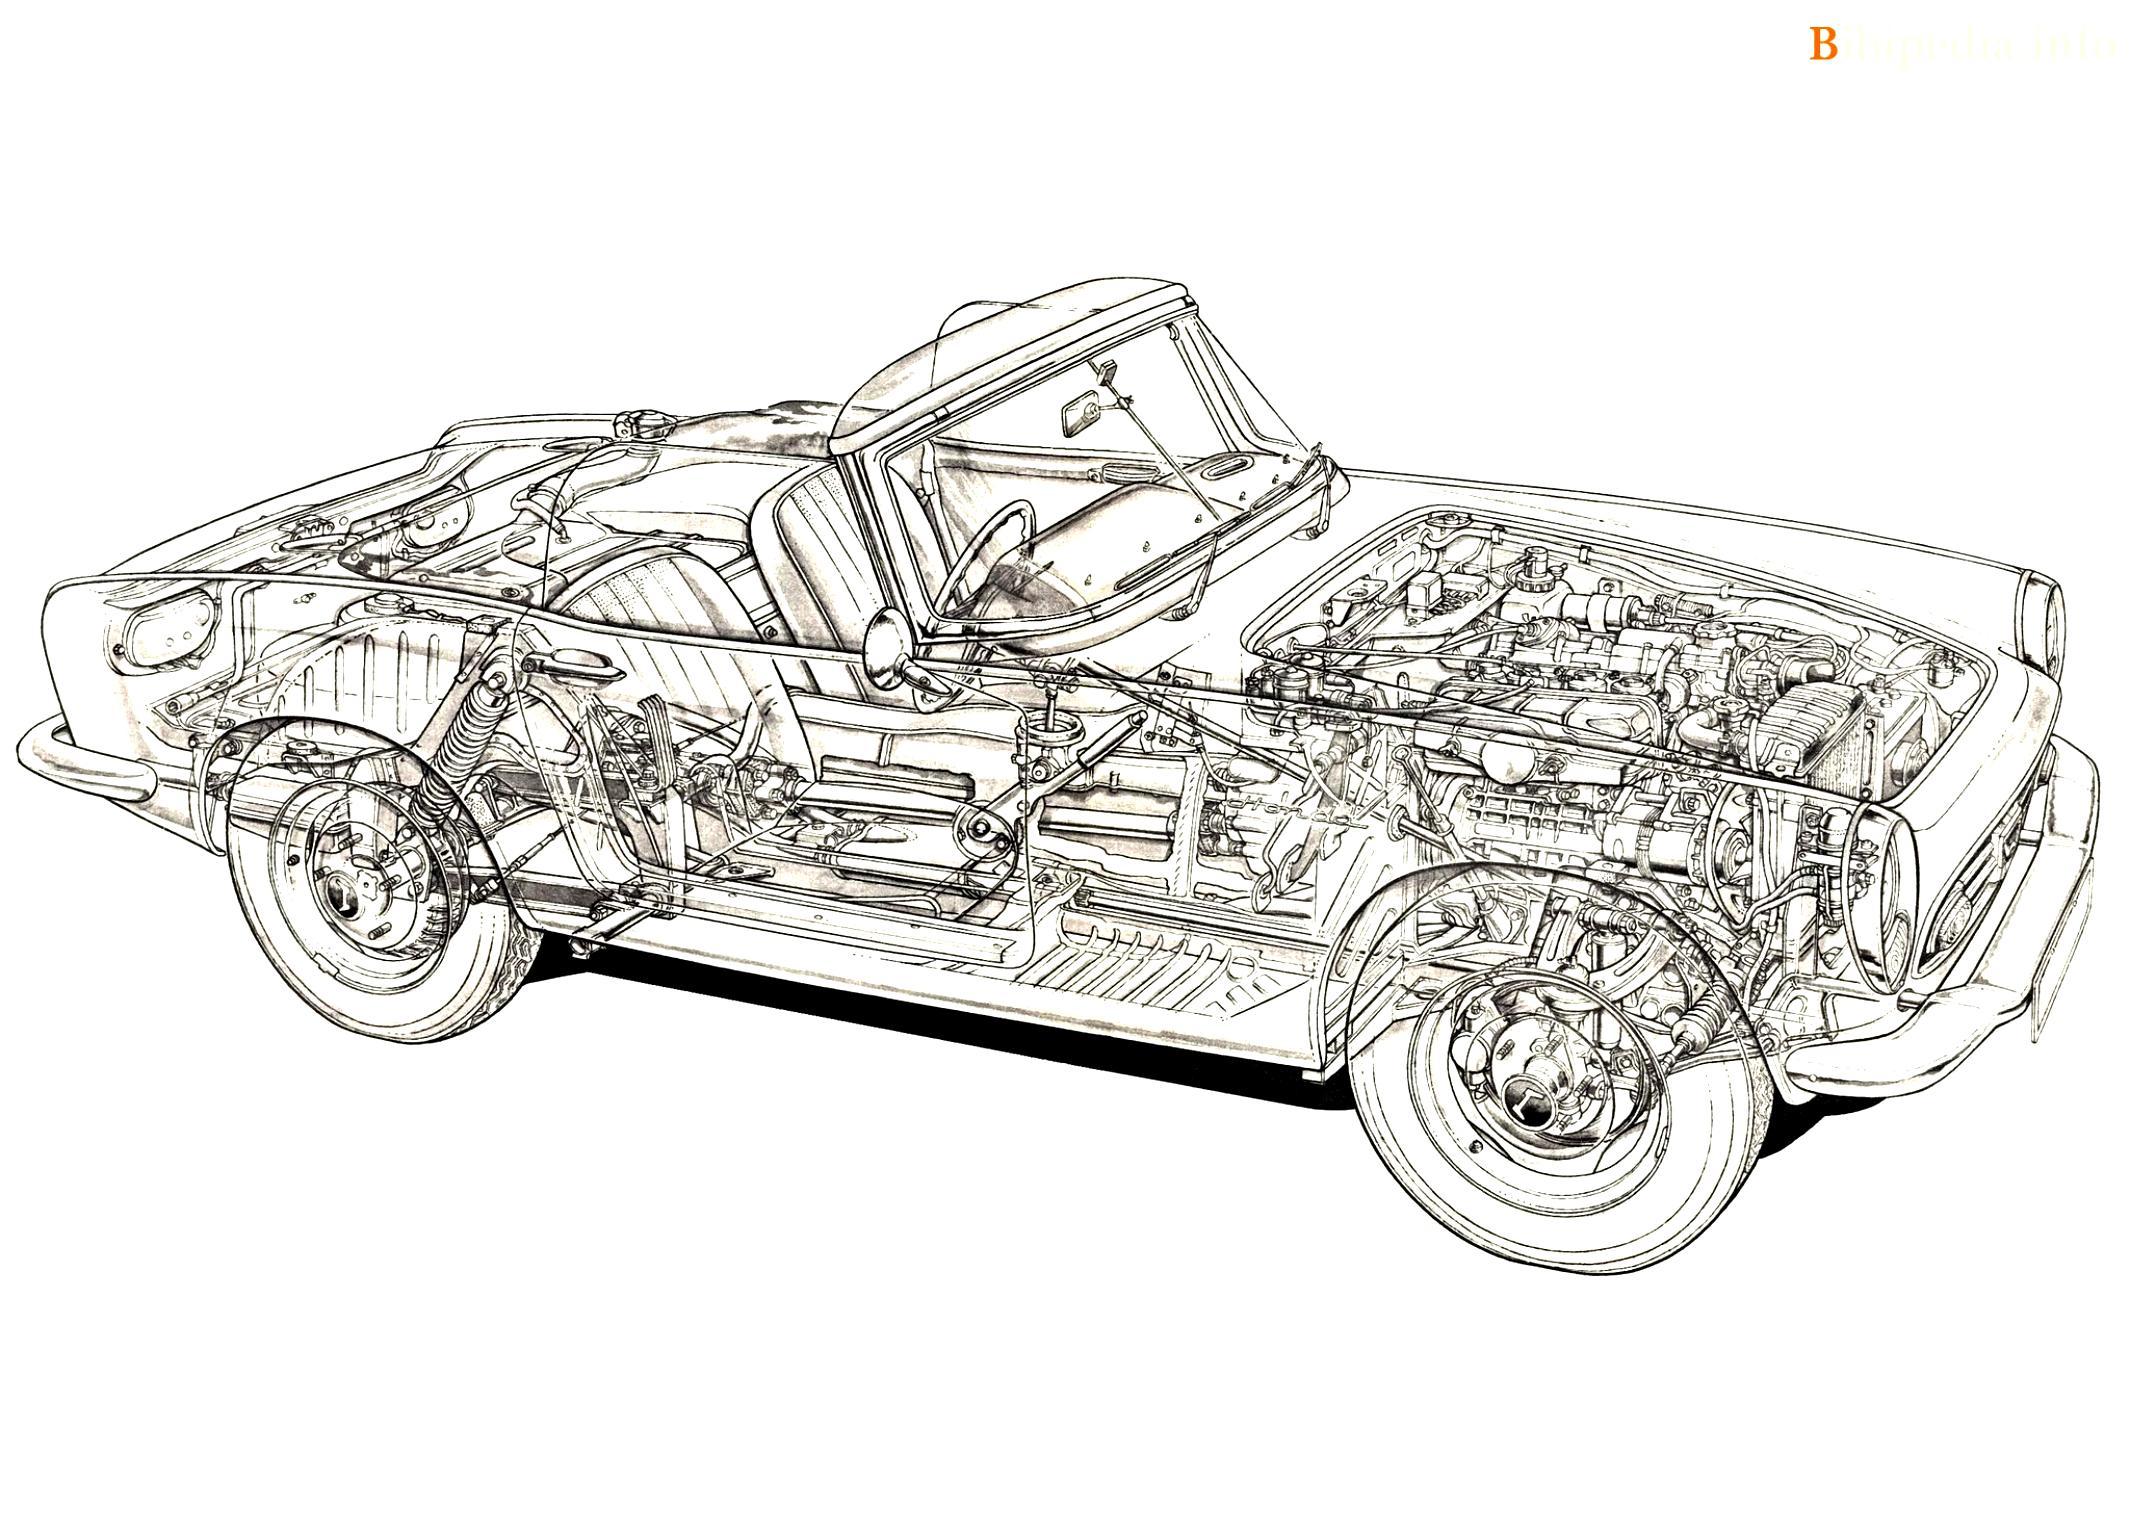 Honda S800C 1966 on MotoImg.com